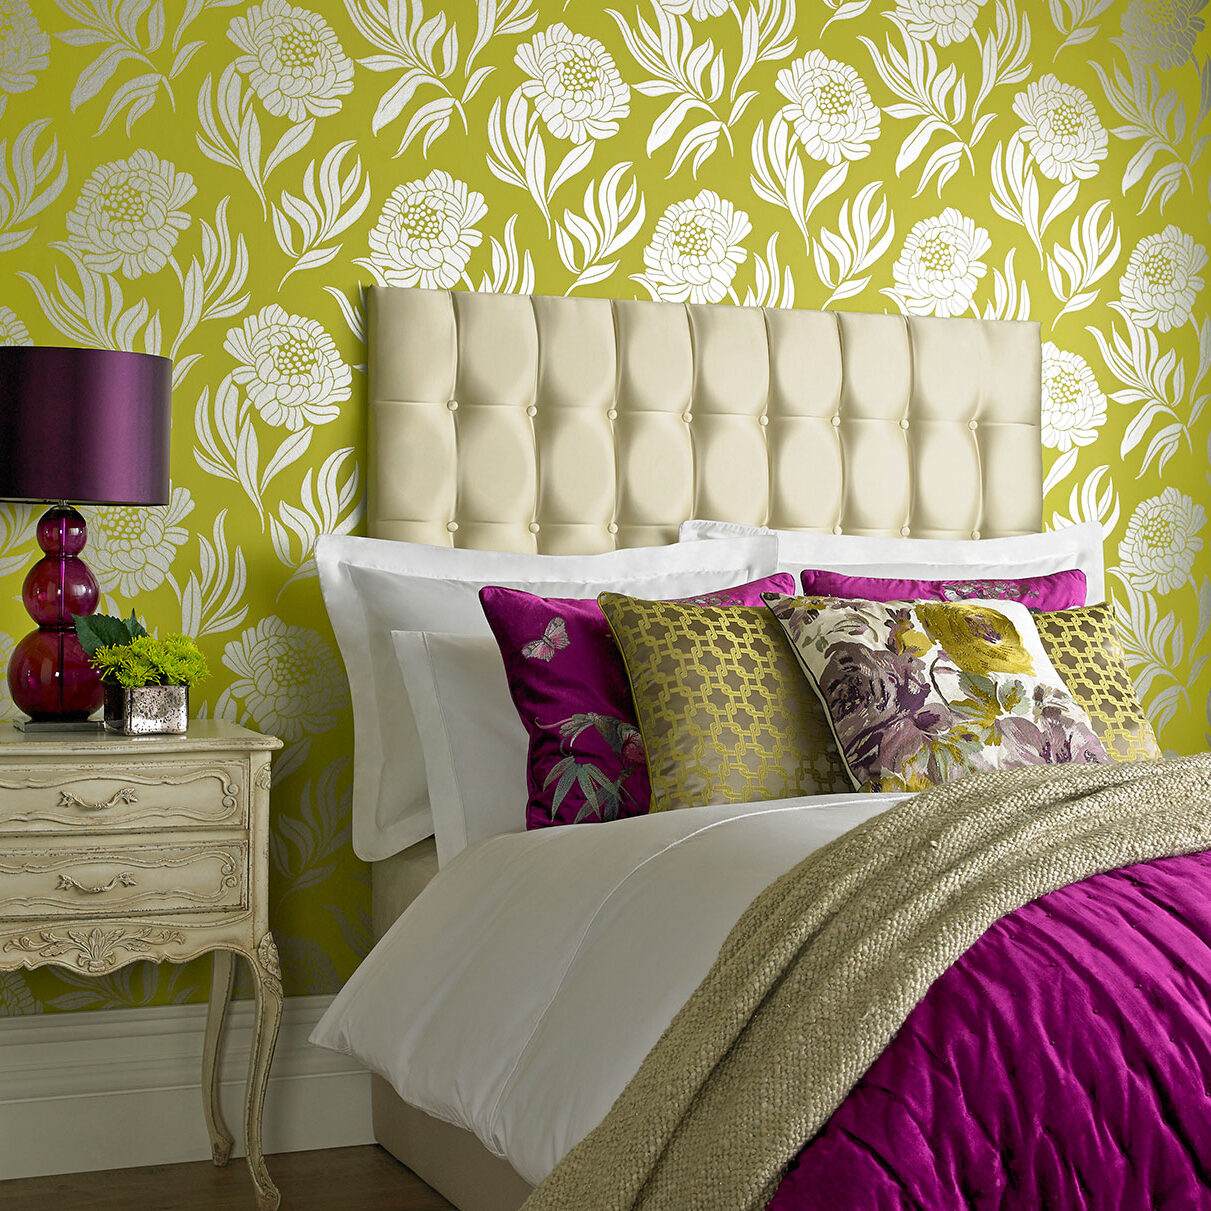 upholstered headboard, pillows, wallpaper in bedroom